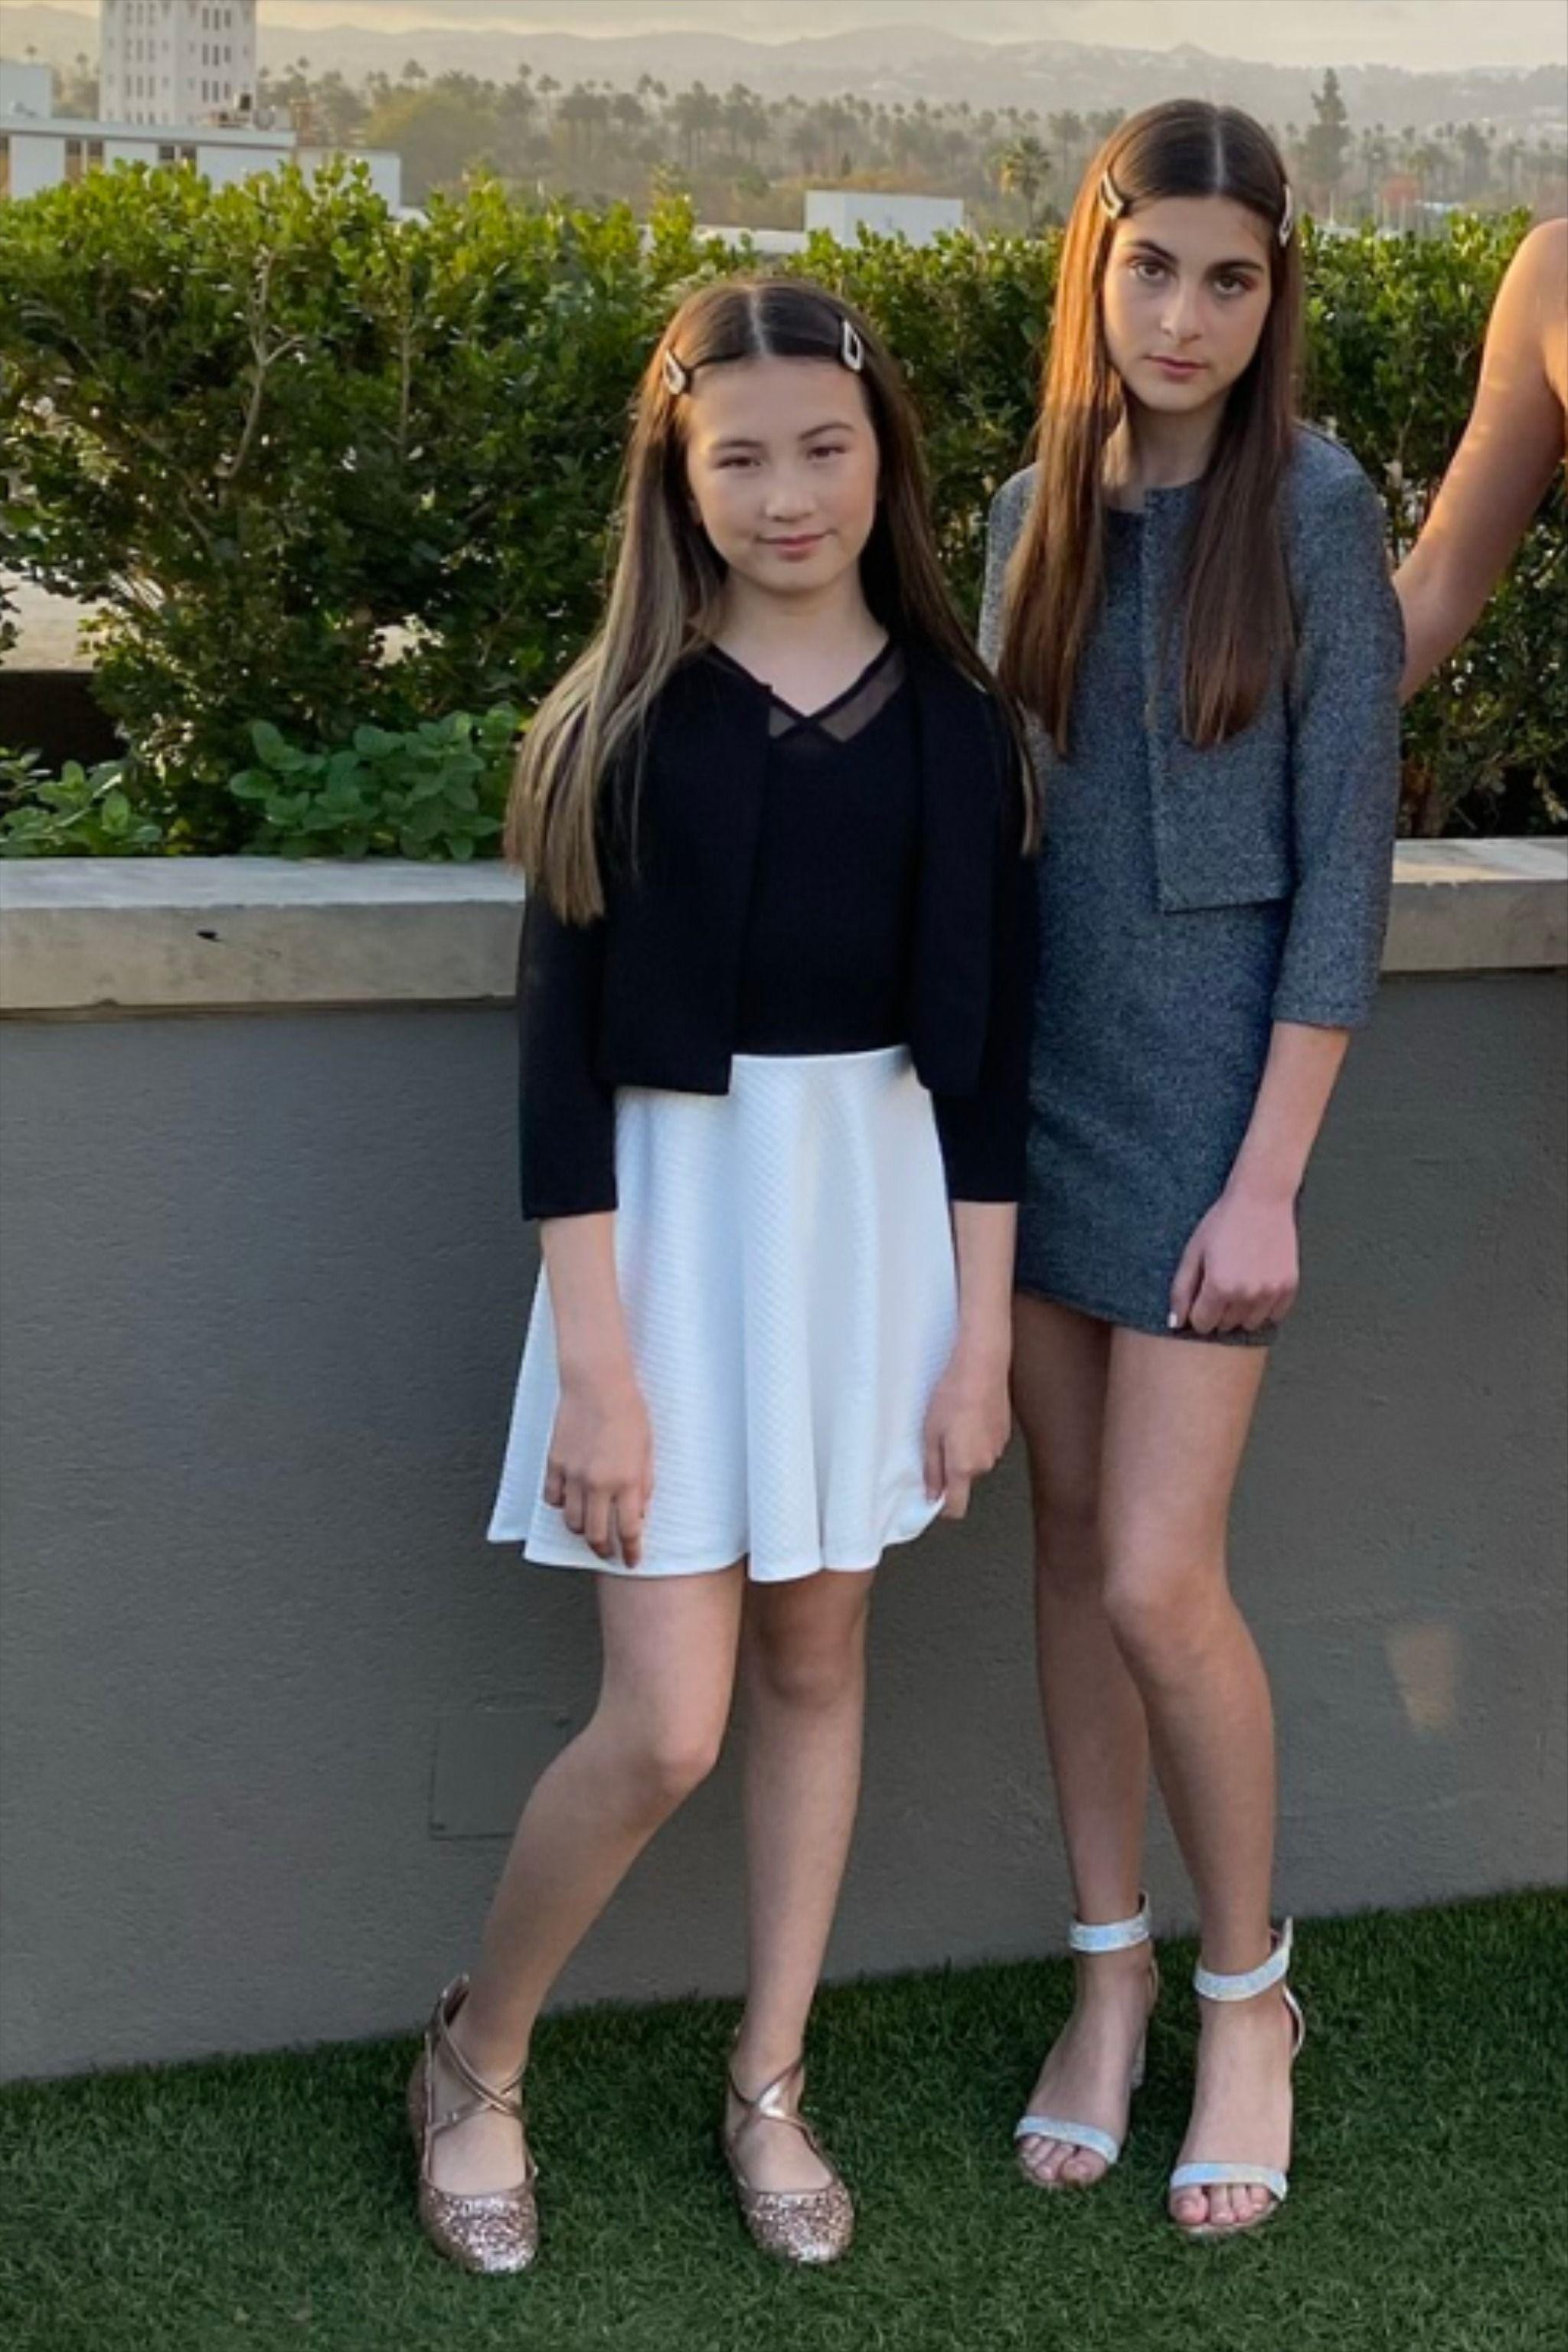 Sally Miller Girls Tie Back Top in Blush